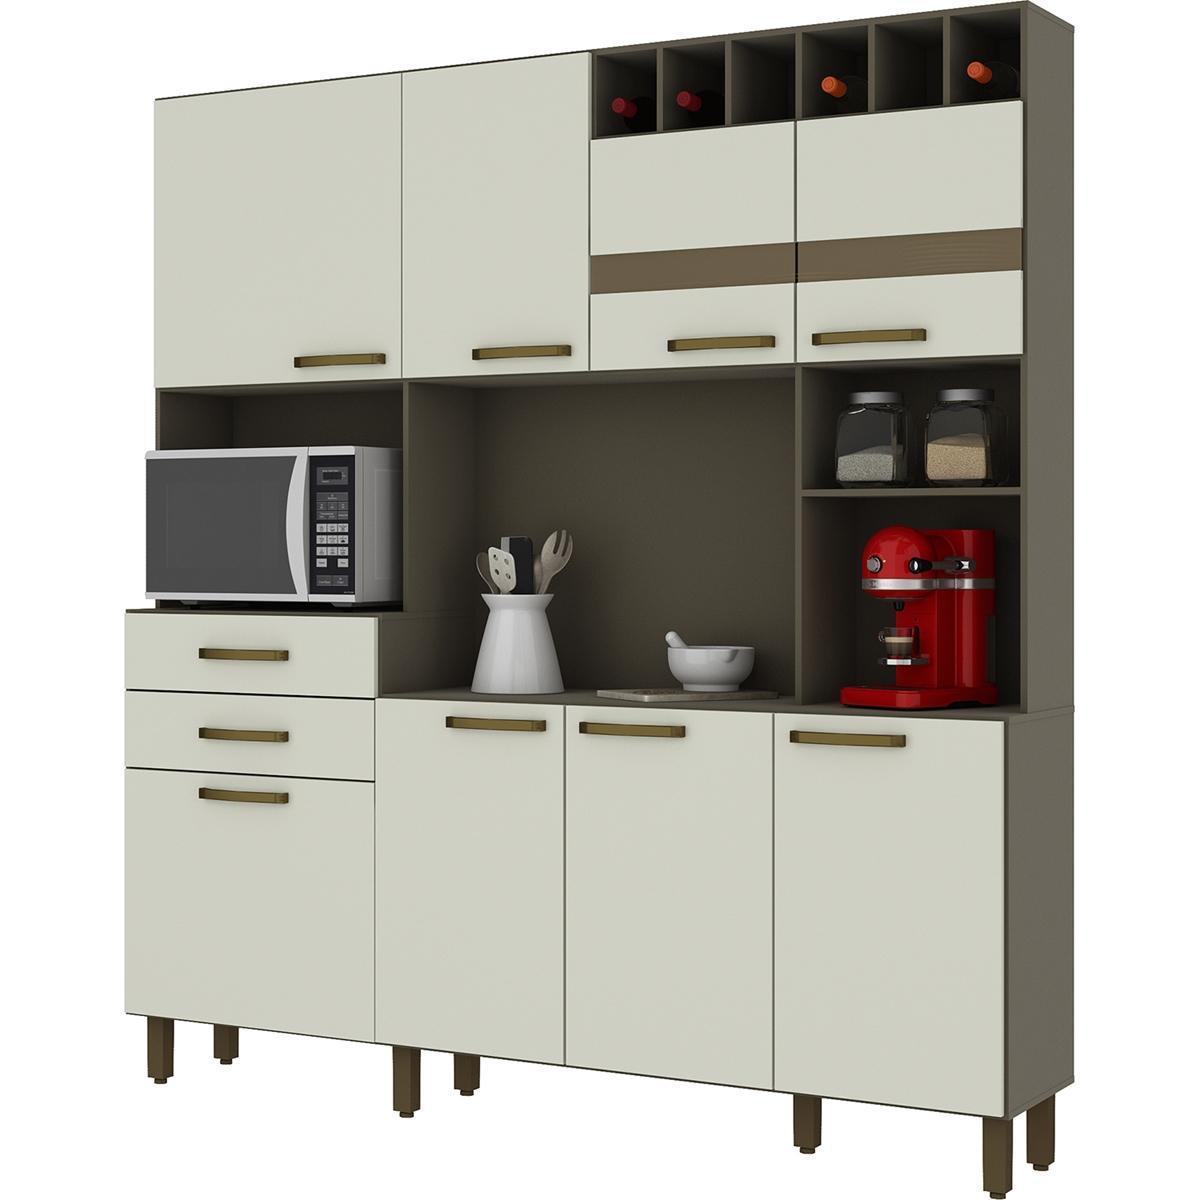 Kit Cozinha Compacta Damasco HP/Areia HP - Briz